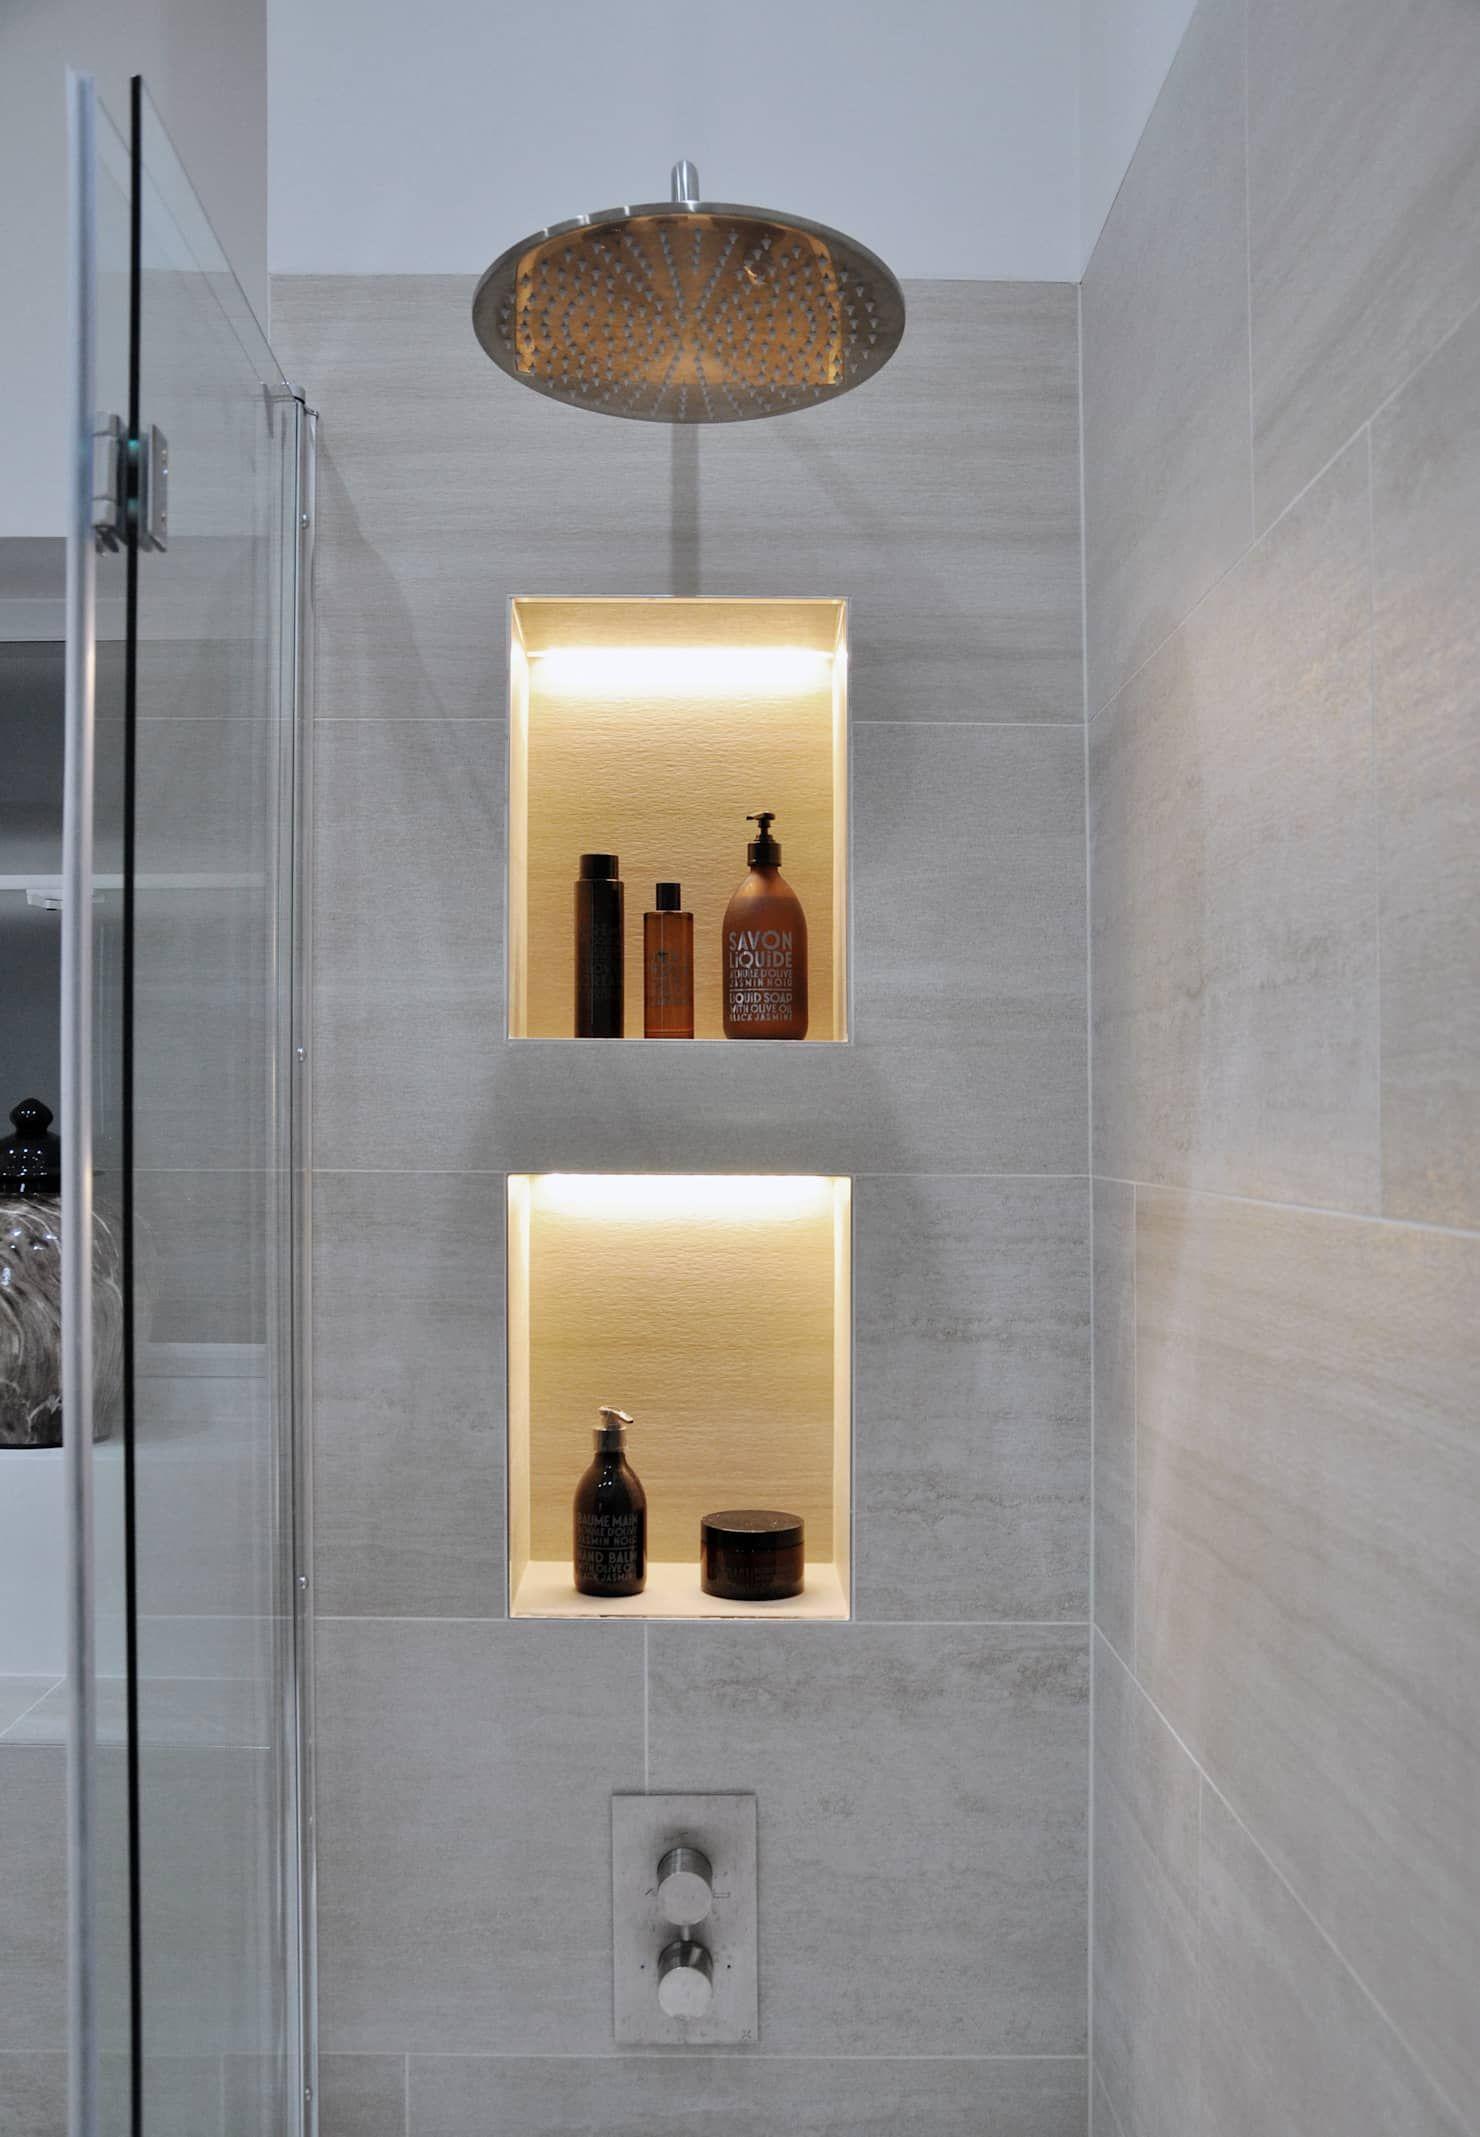 Photo of Apartment renovation moderne badezimmer von homify modern | homify